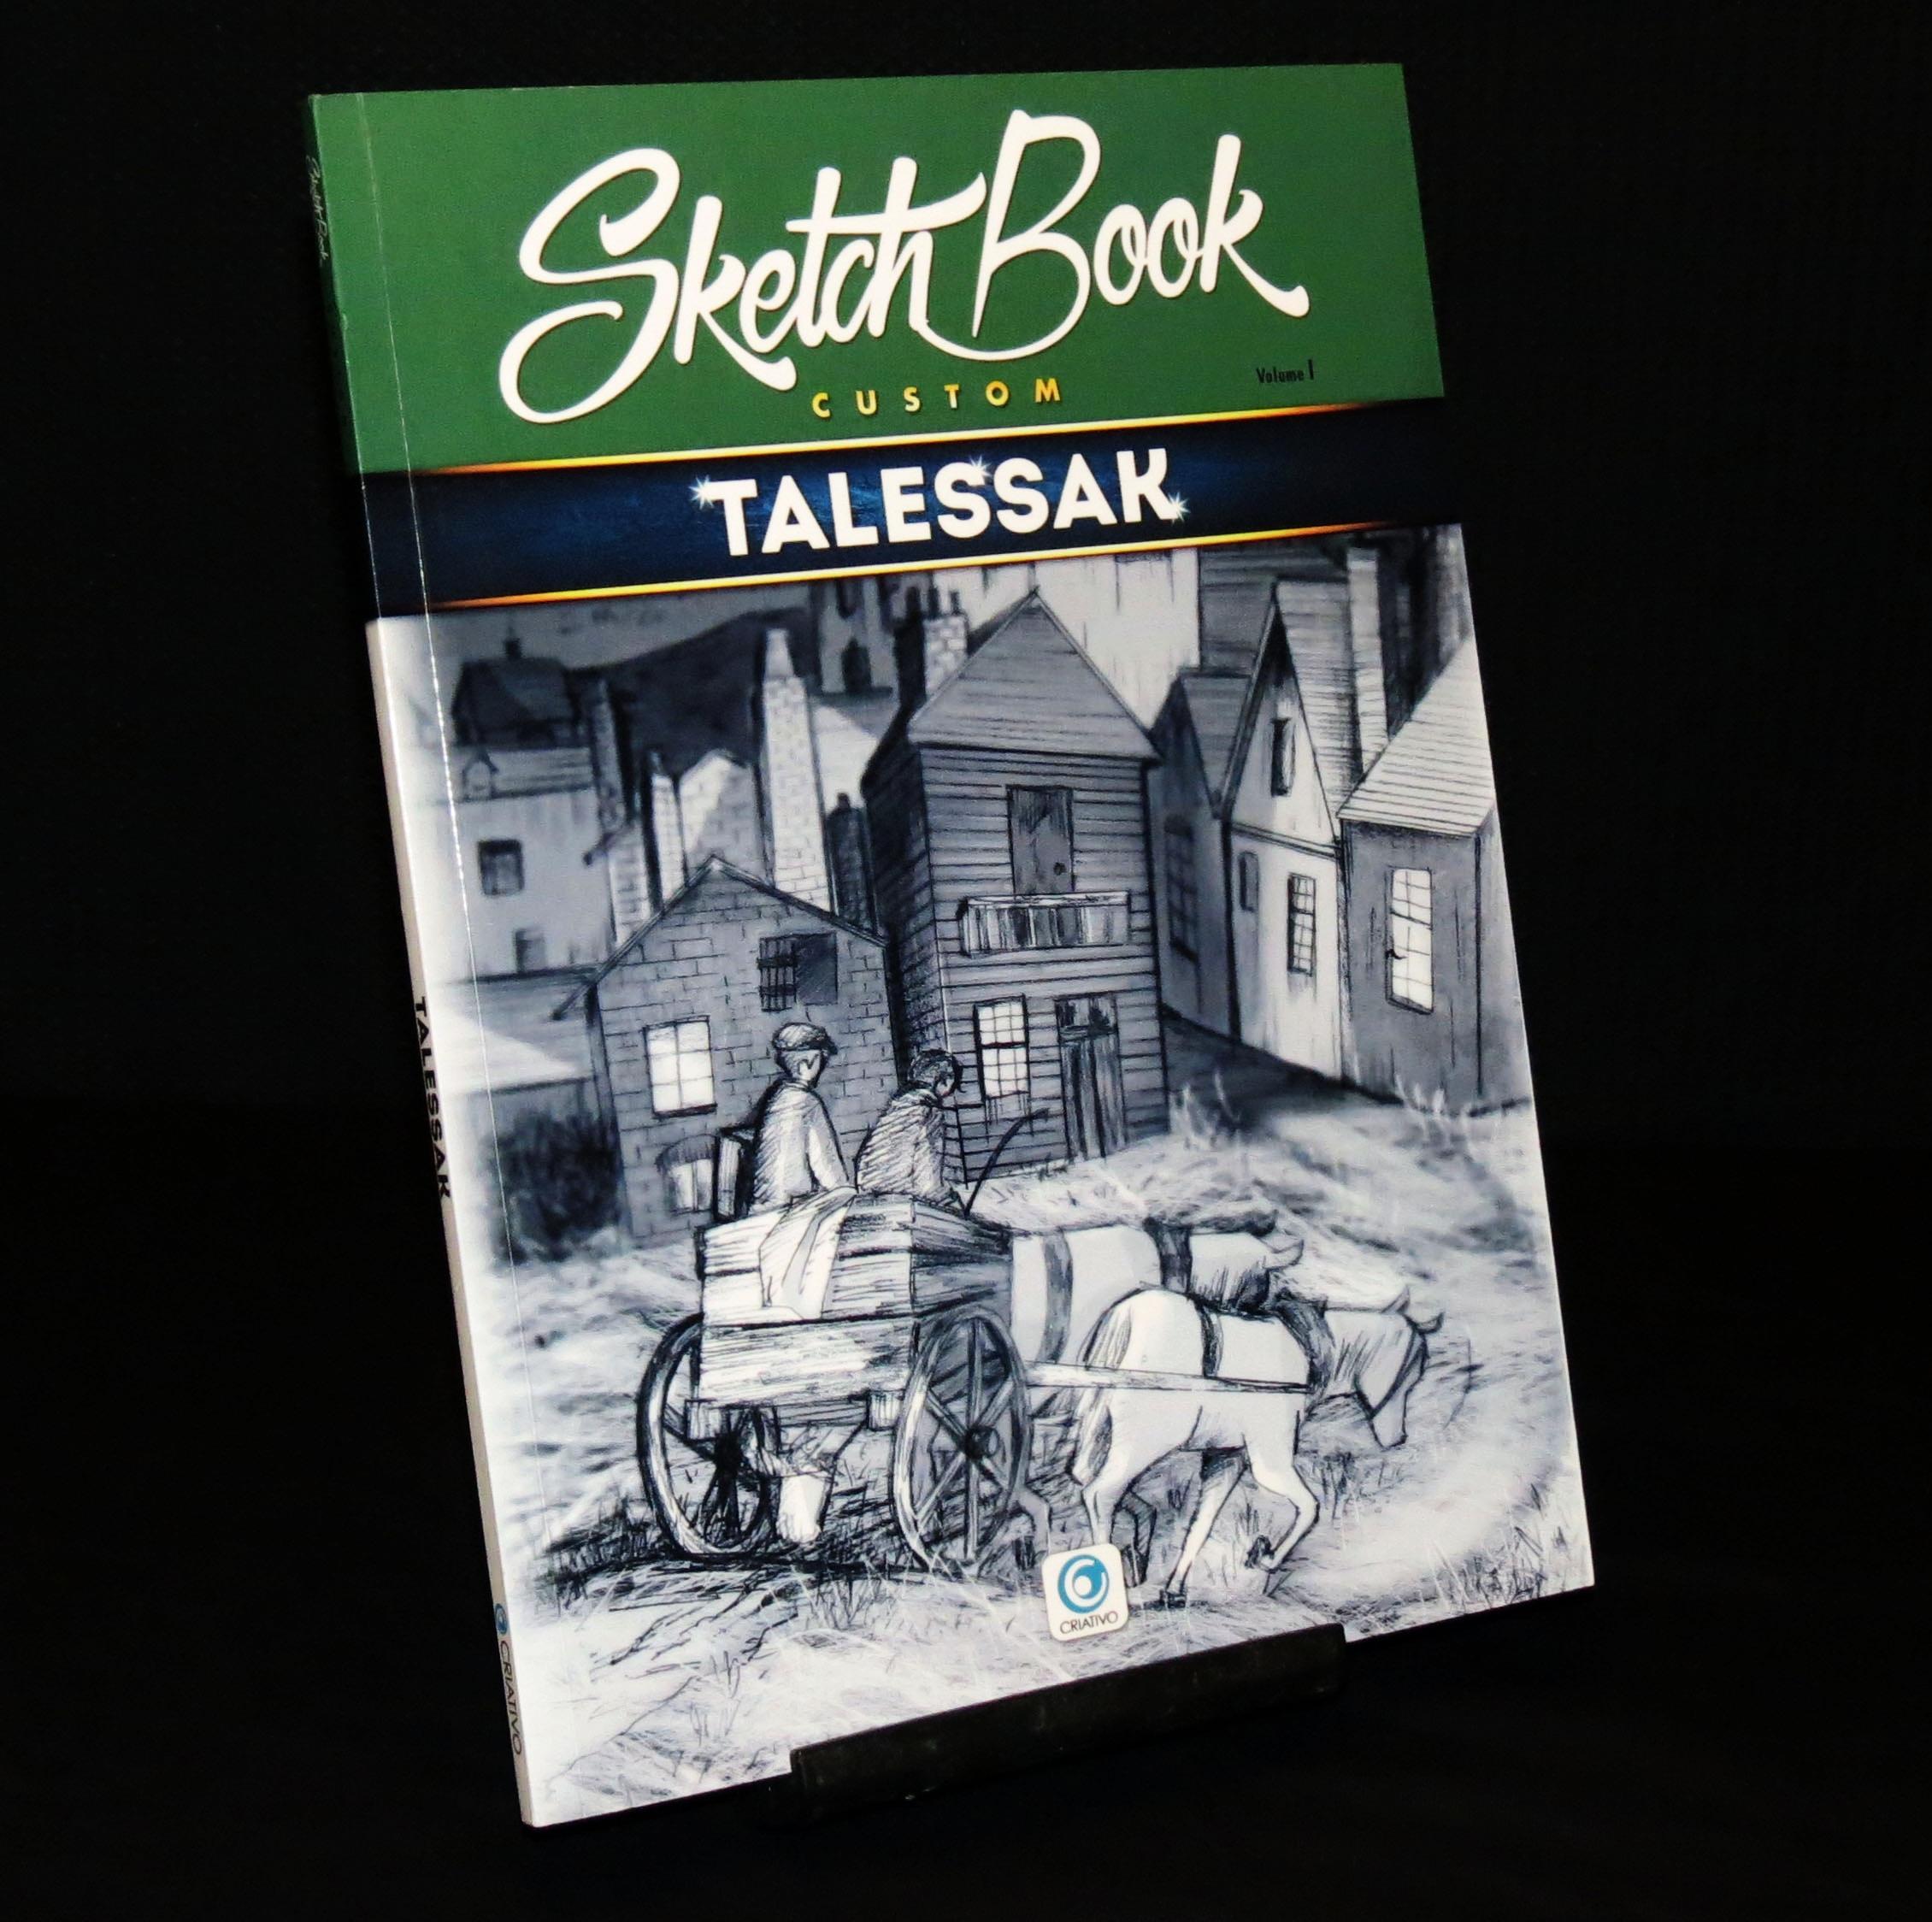 Scketchbook Custom Published by Criativo, 2017